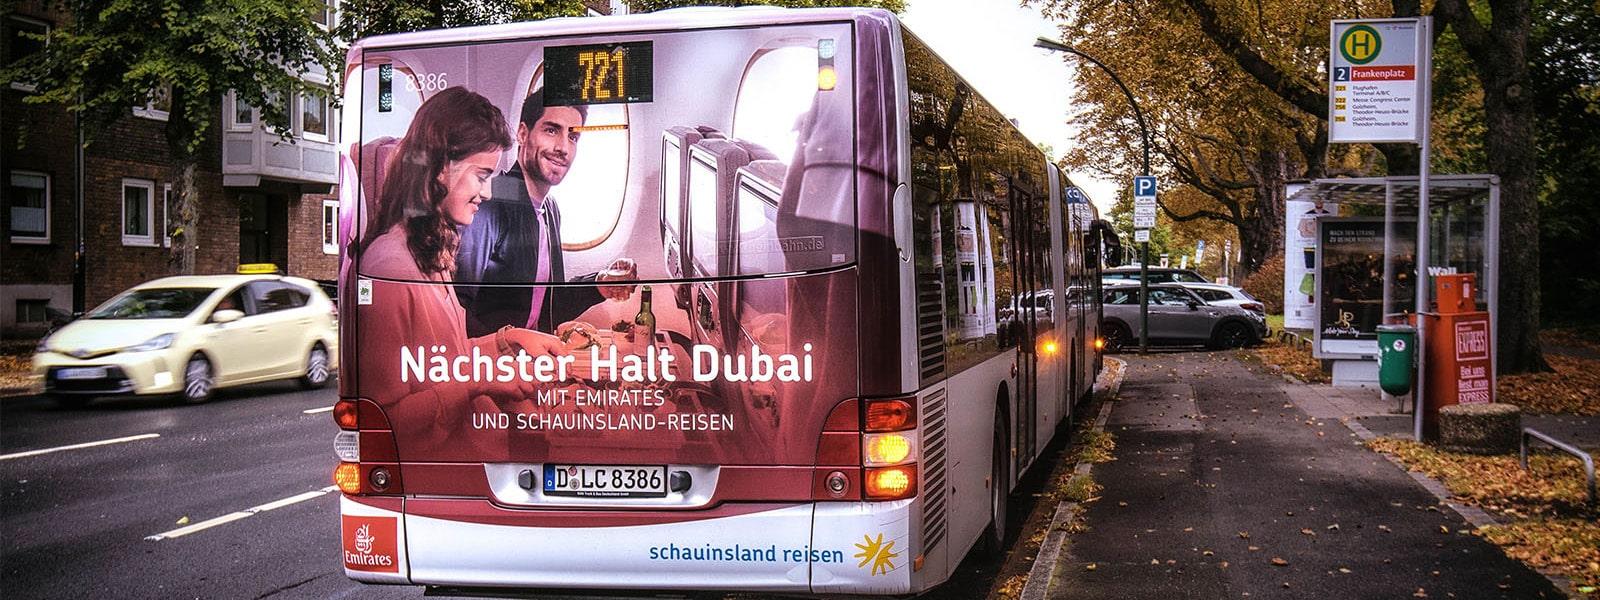 Bremen-Verkehrsmittelwerbung-Bus-Heckflaechenwerbung